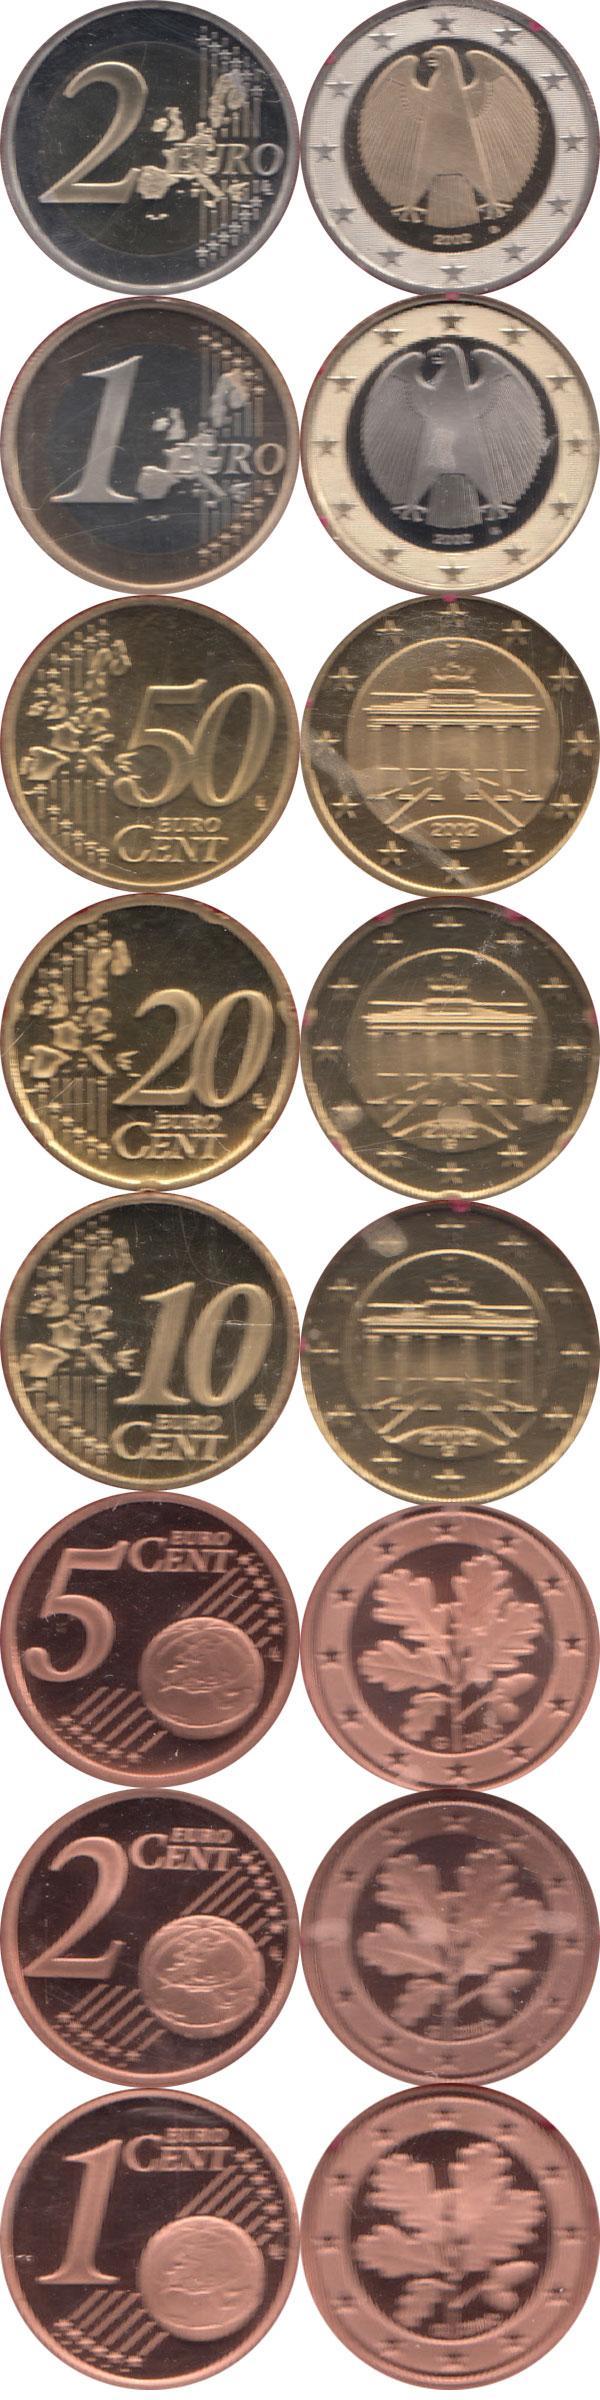 Каталог монет - Германия Евронабор 2002, Чеканка Карлсруэ